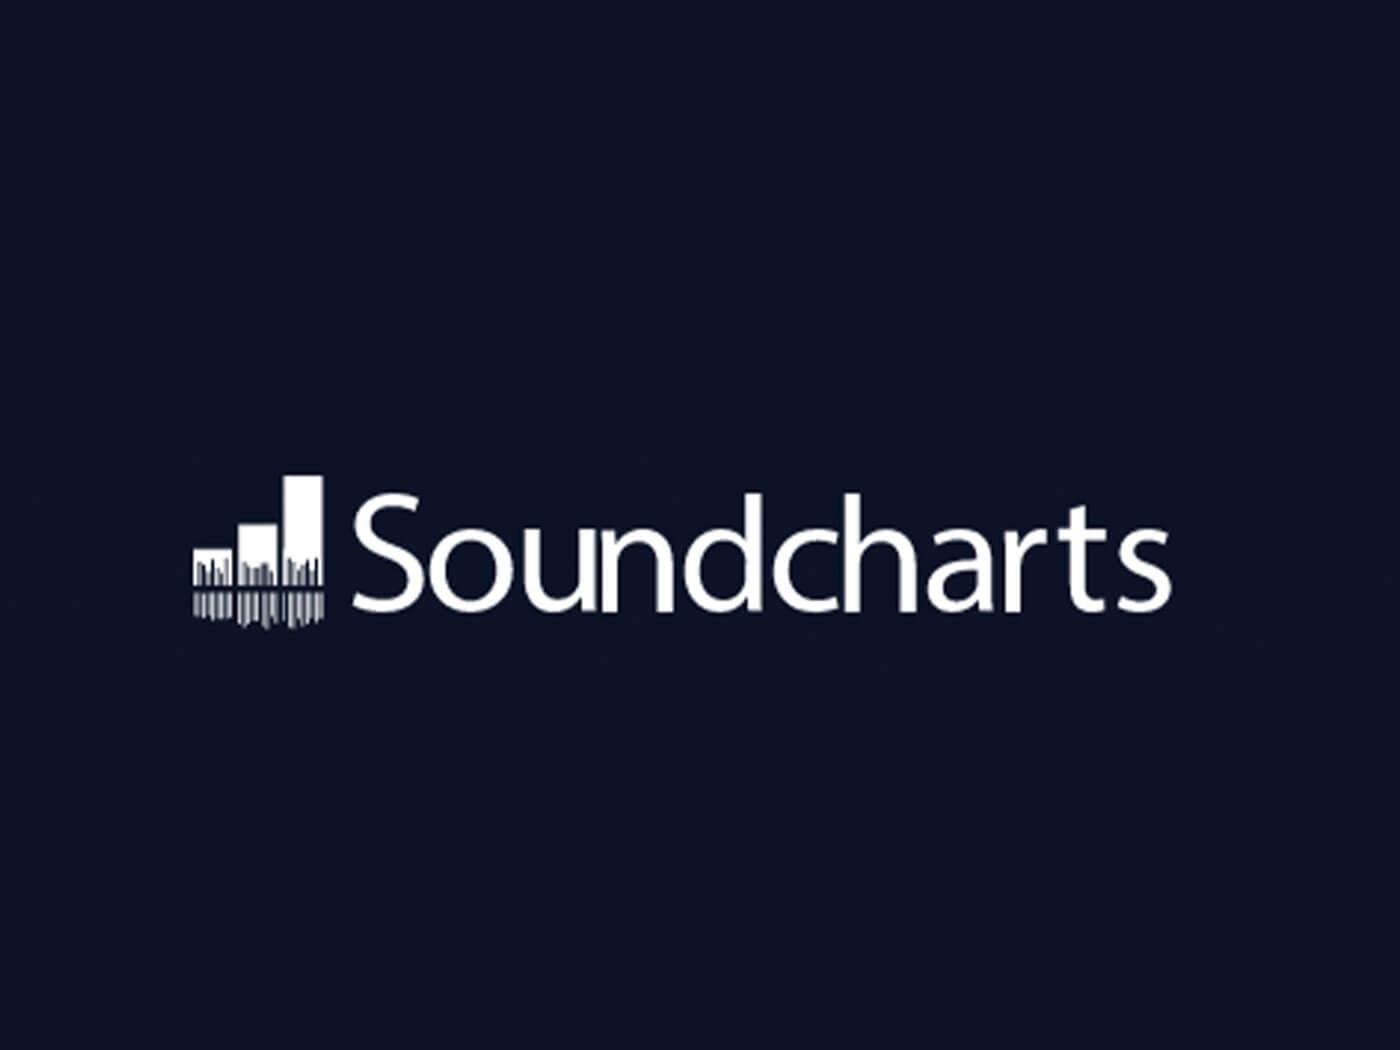 Soundcharts Logo